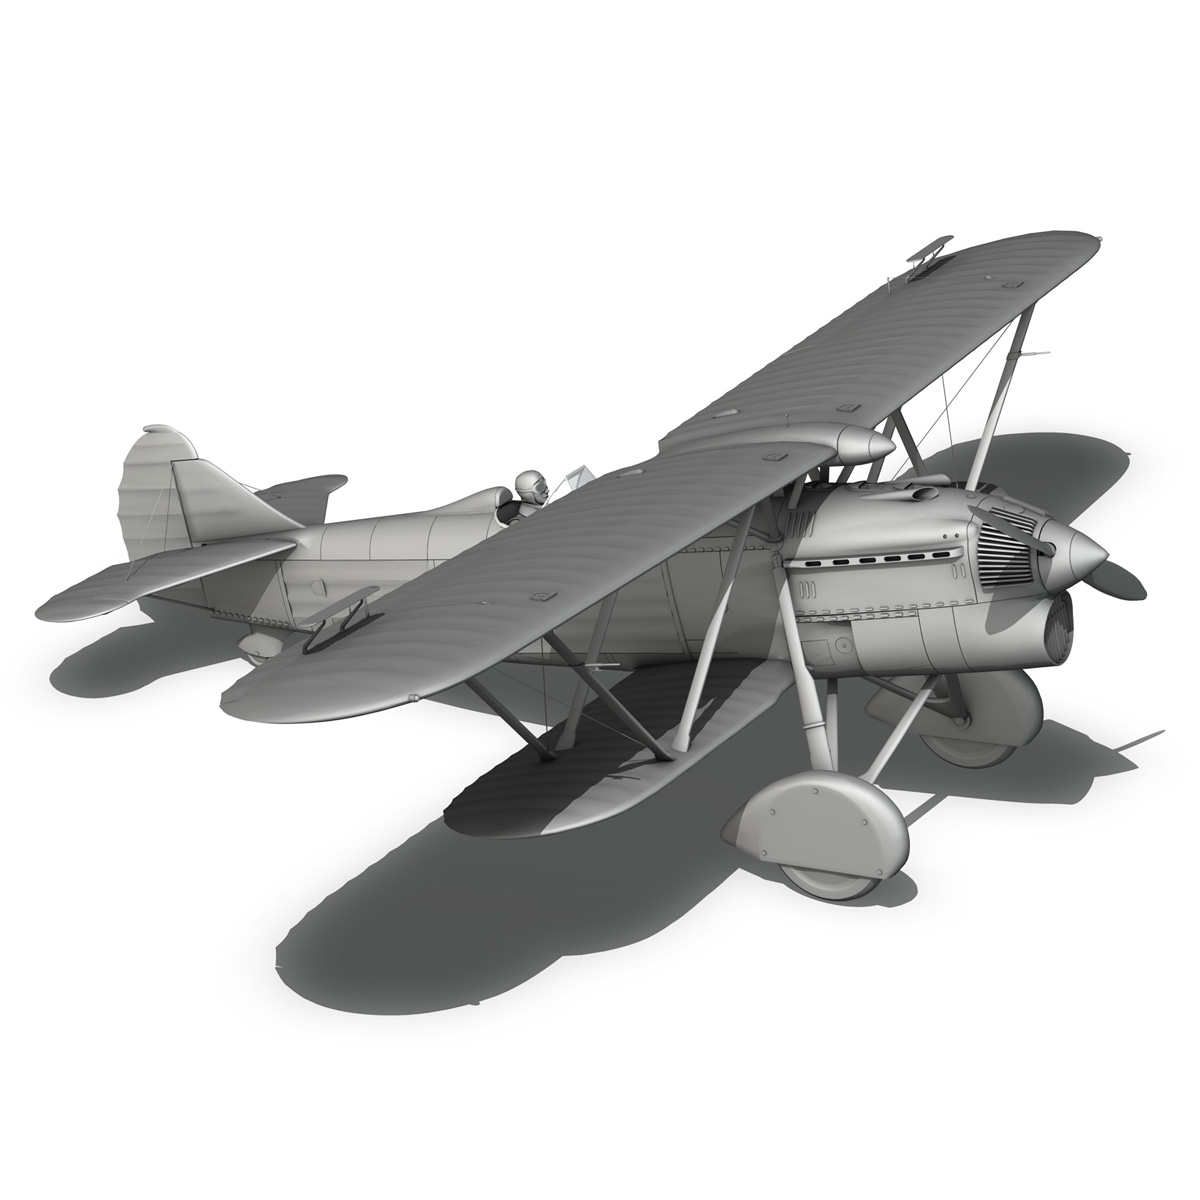 fiat cr.32 – italy air force – xvi gruppo 3d model fbx lwo lw lws obj c4d 266319